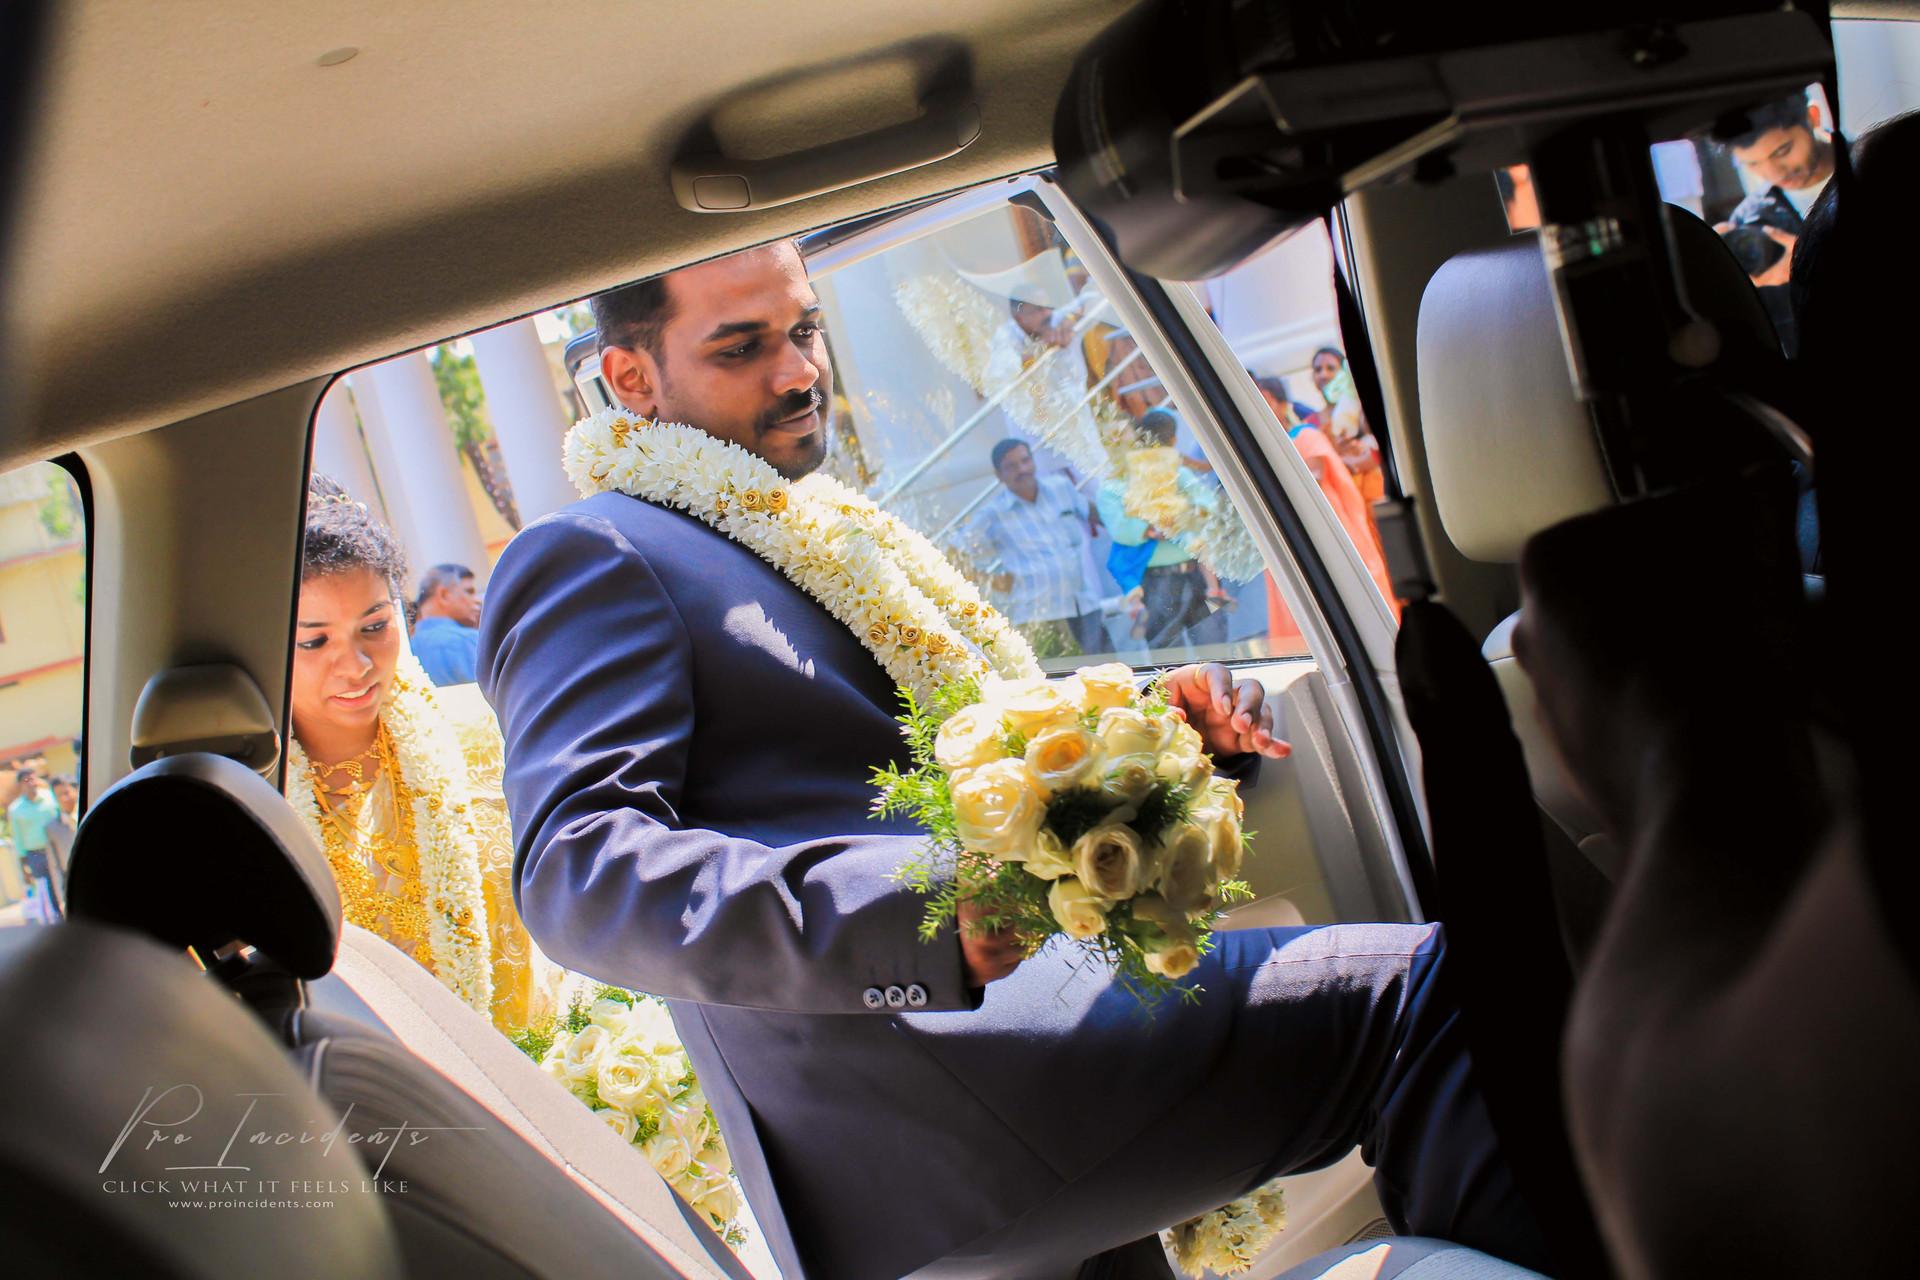 Groom Bride CSI Christian wedding candid moments photos